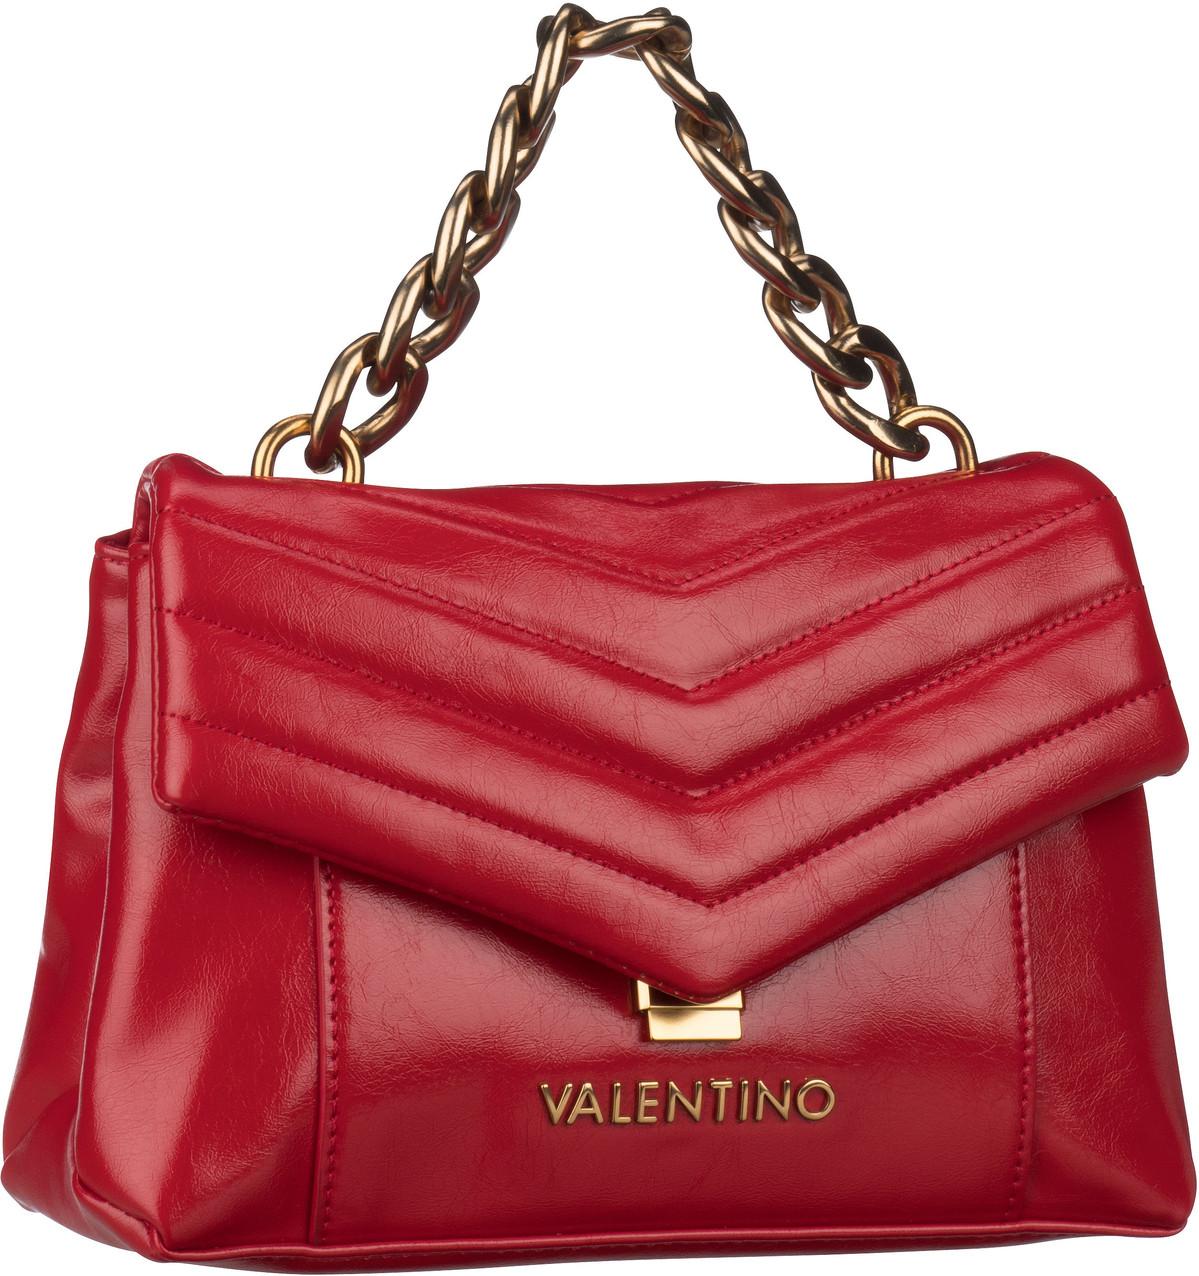 Bags Handtasche Grifone Cartella W04 Rosso